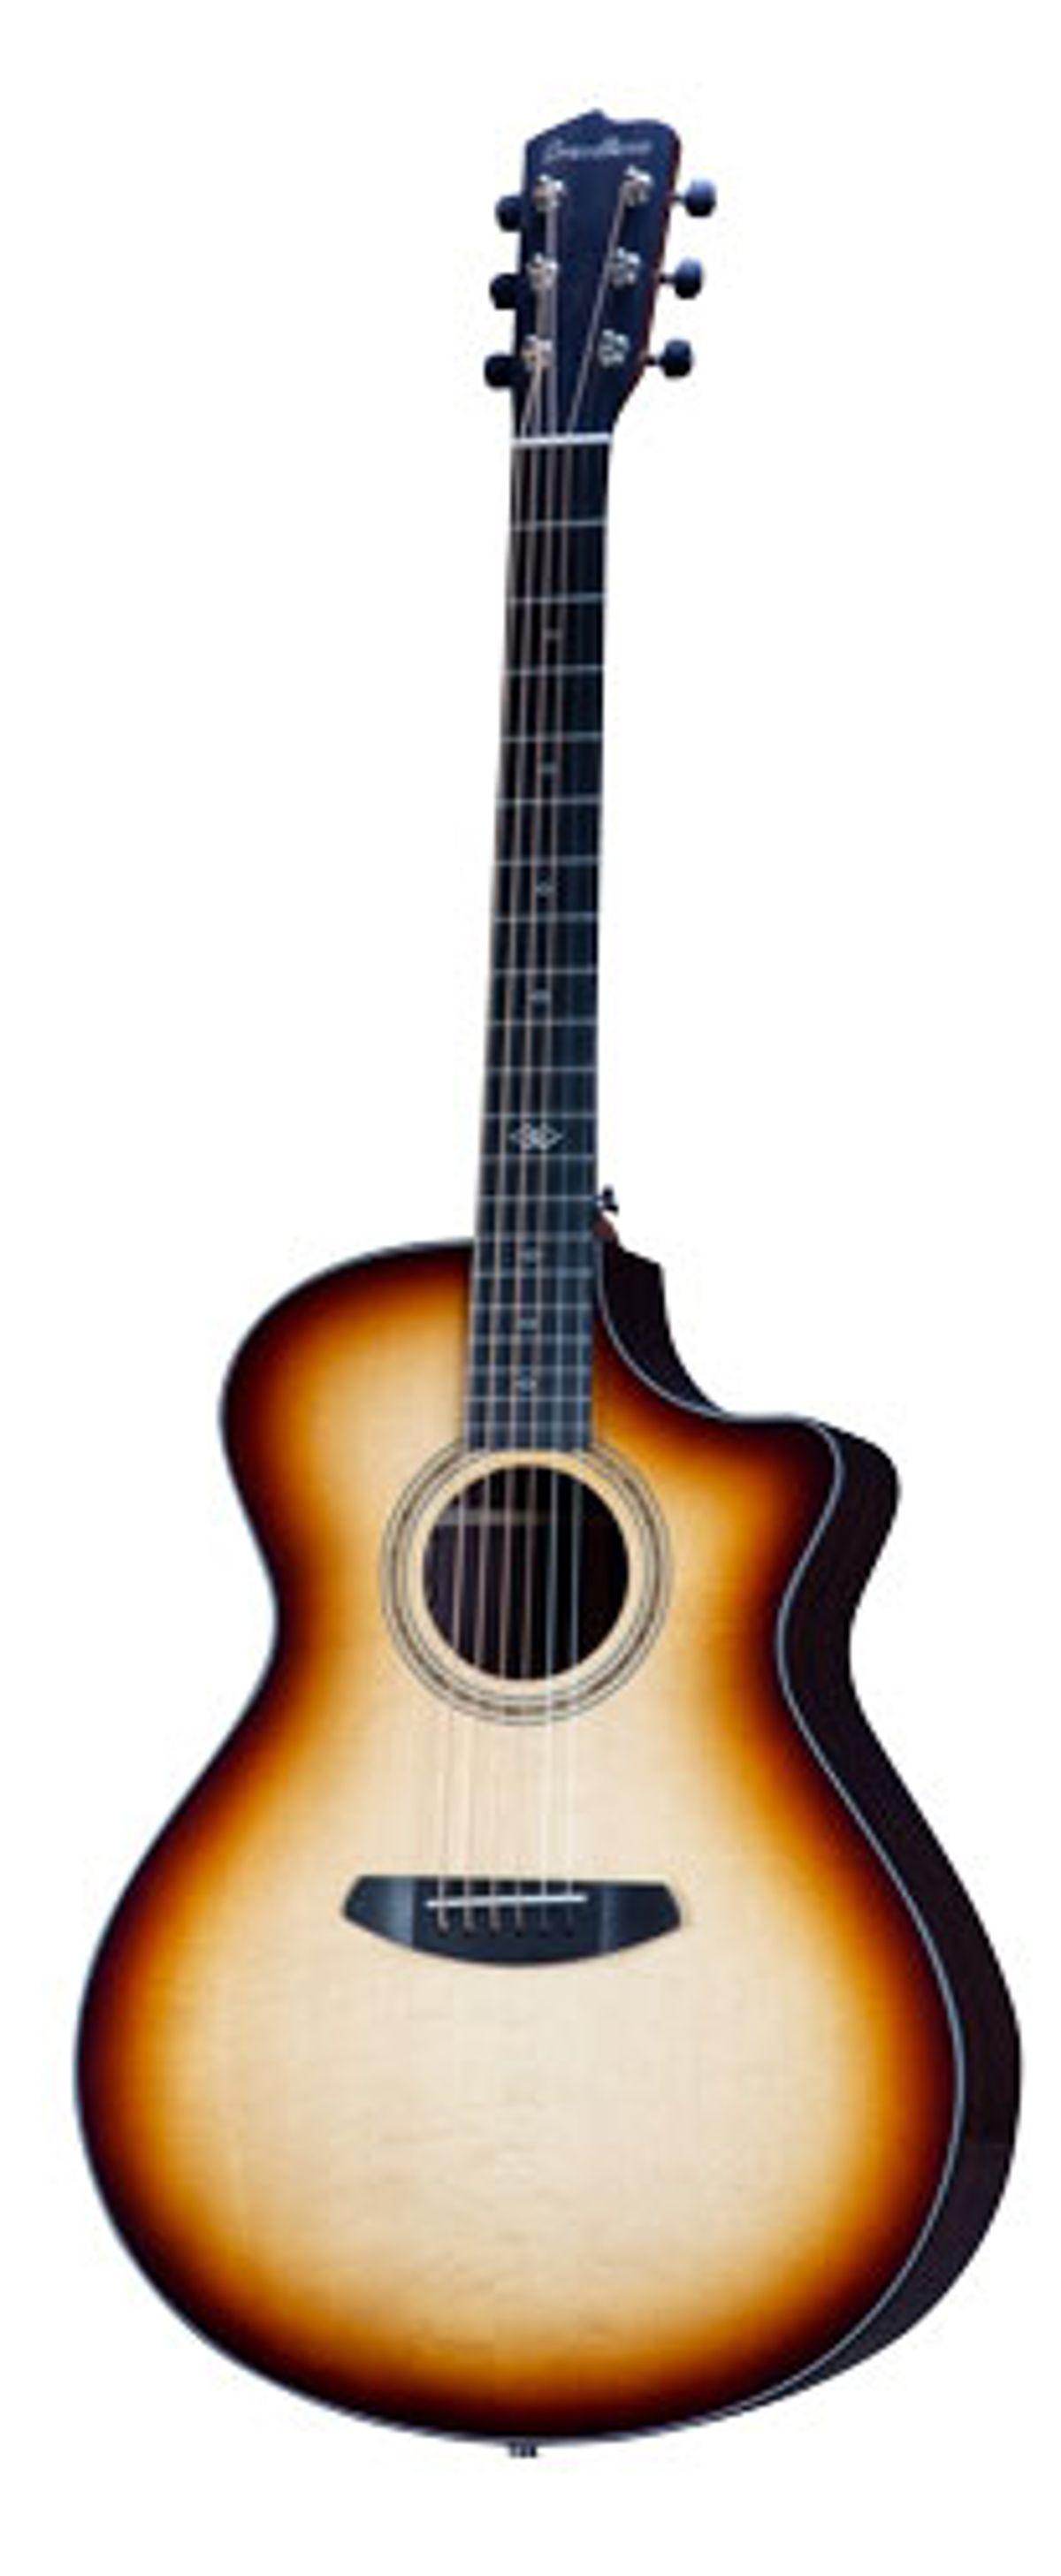 Breedlove Guitars Announces Updated Premier Series